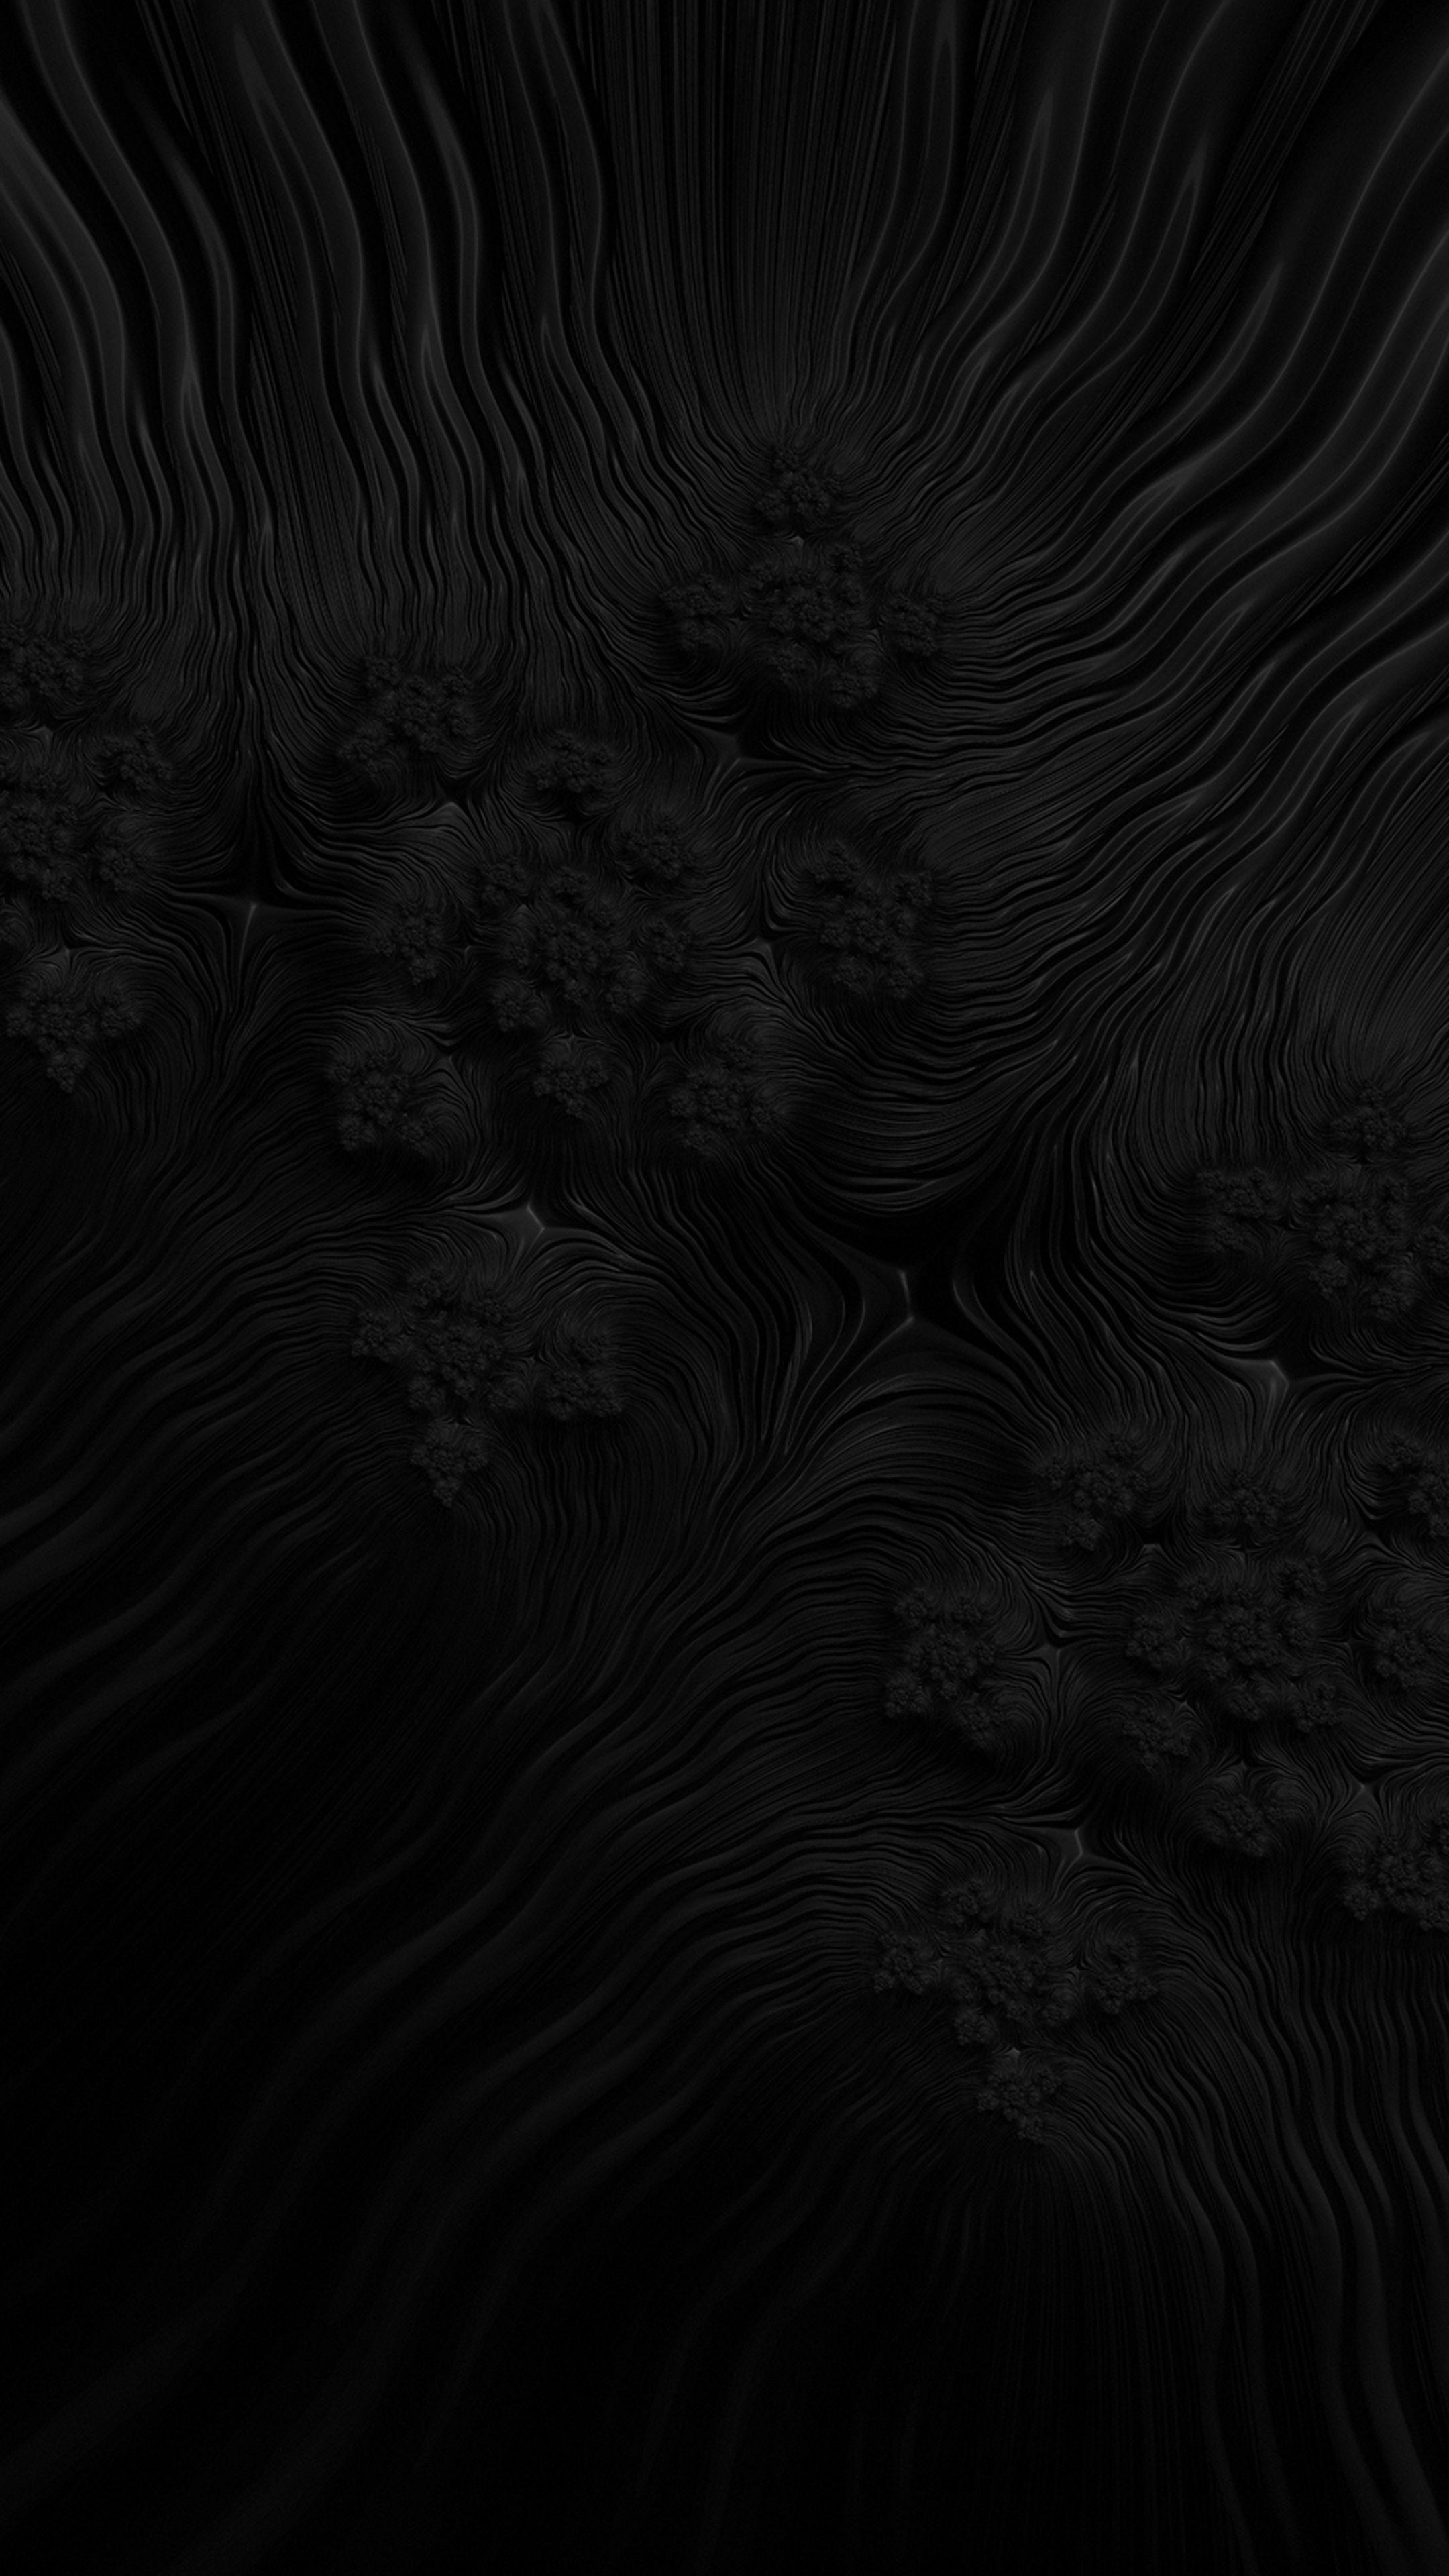 Black Wallpaper Black Wallpaper Dark Wallpaper Wallpaper